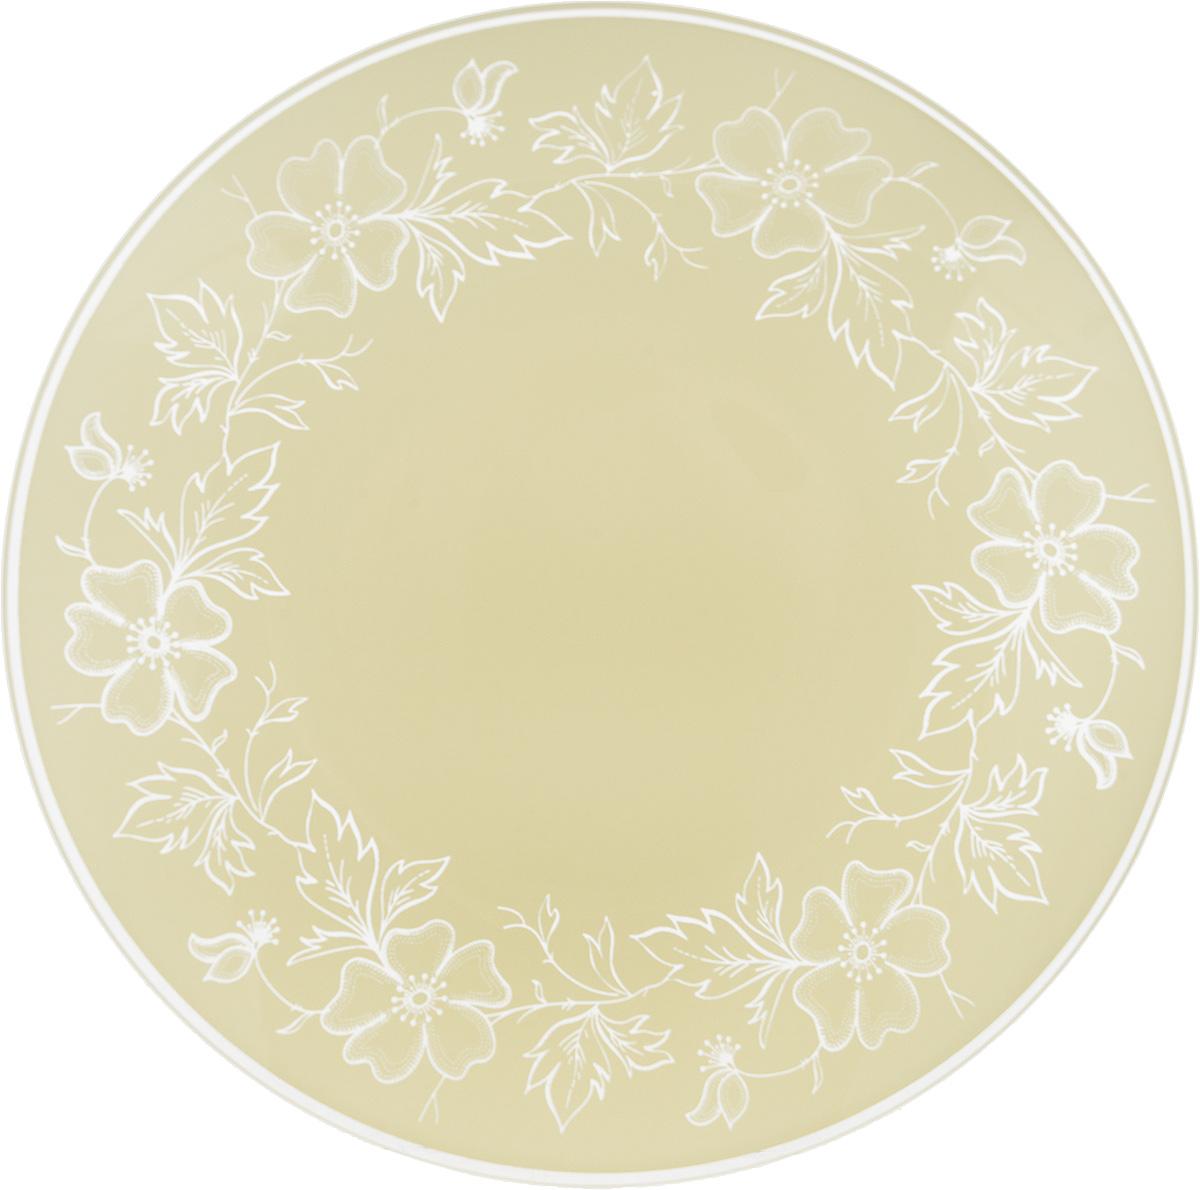 "Тарелка NiNaGlass ""Лара"", цвет: светло-бежевый, диаметр 20 см"